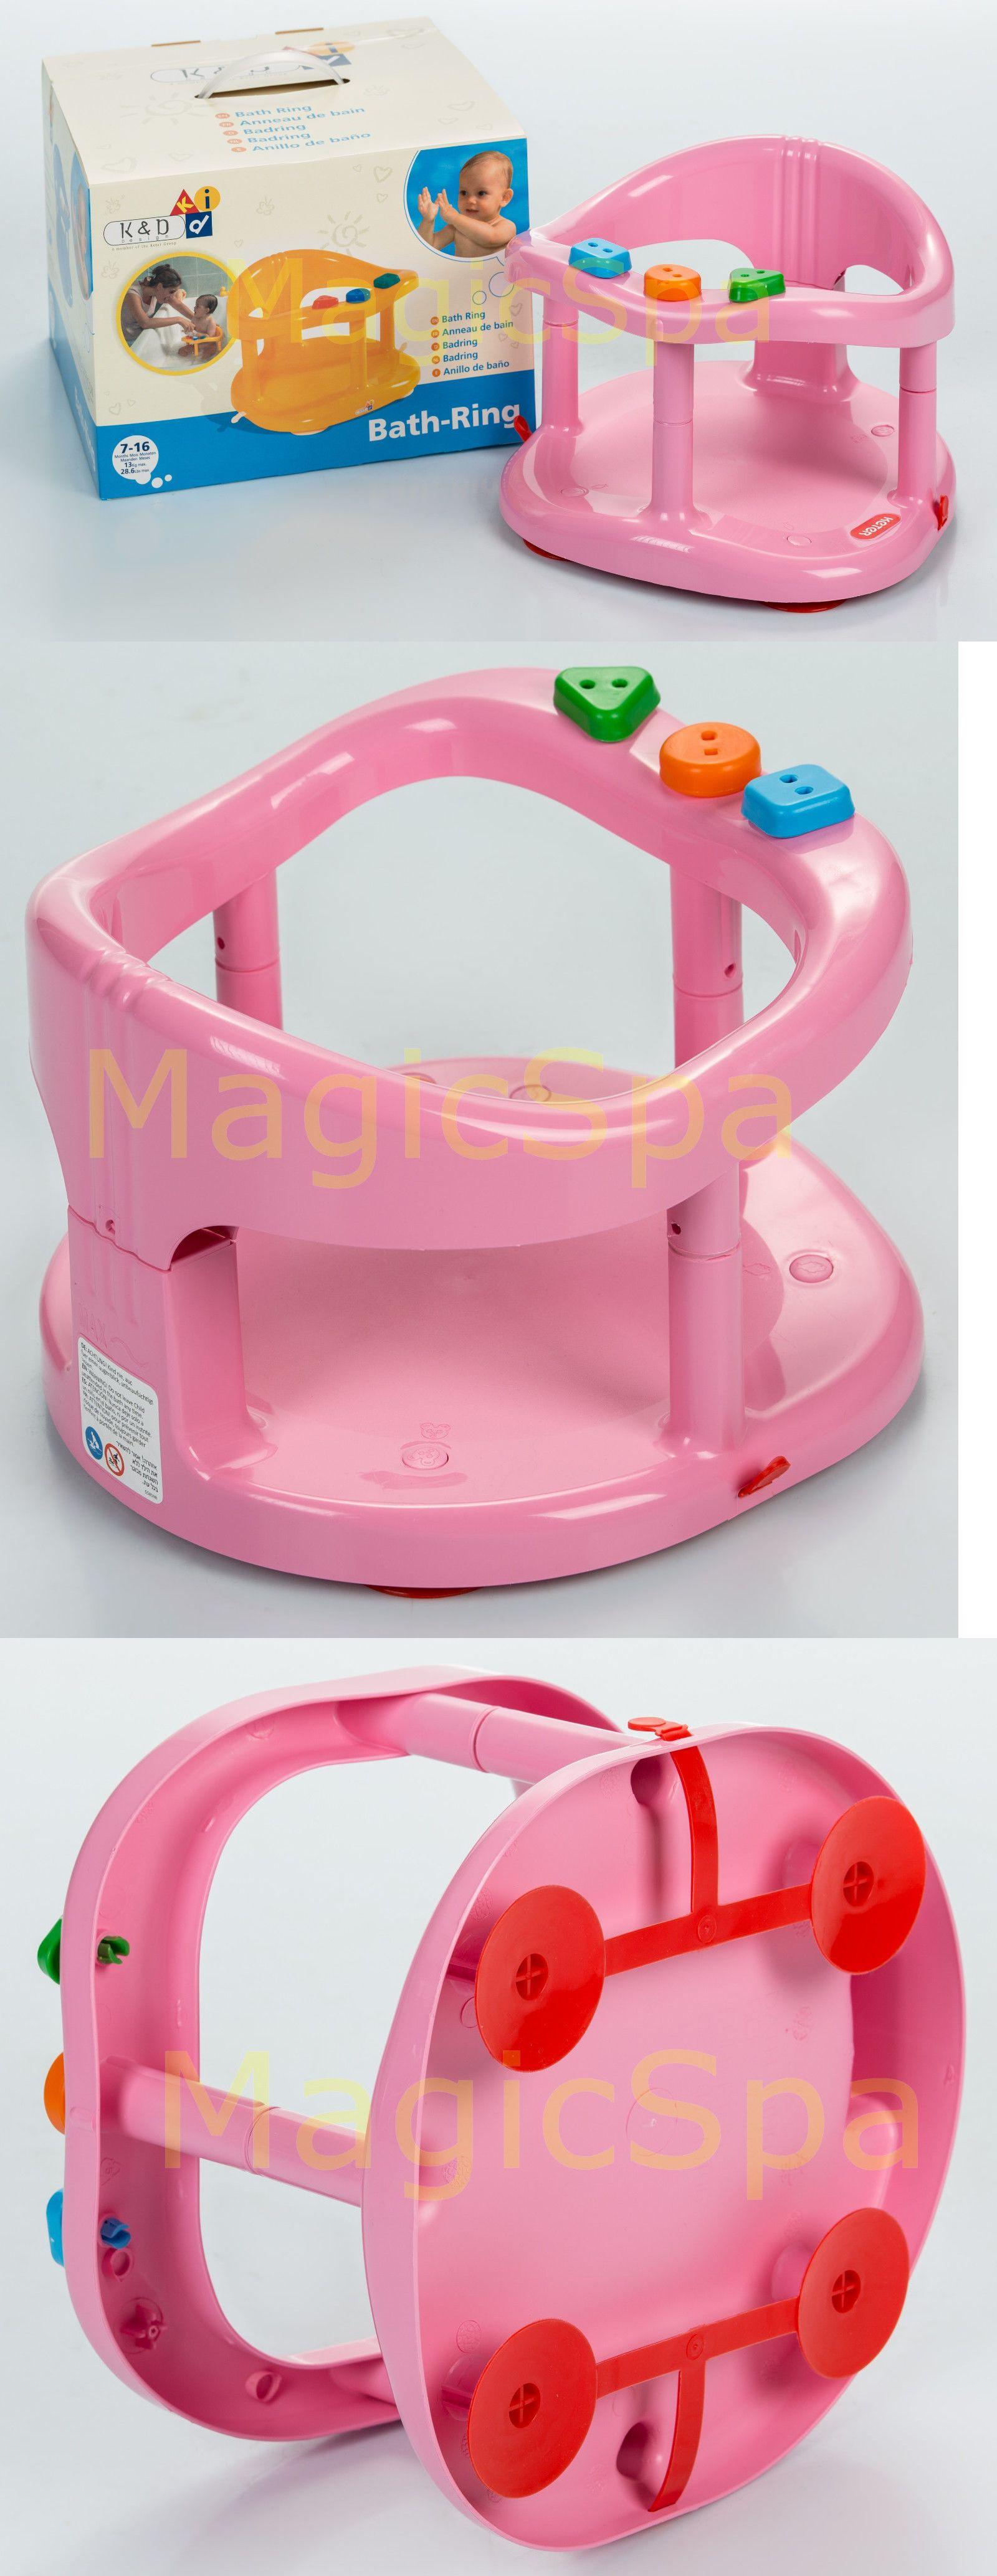 Bath Tub Seats and Rings 162024: Infant Baby Bath Tub Ring Seat ...